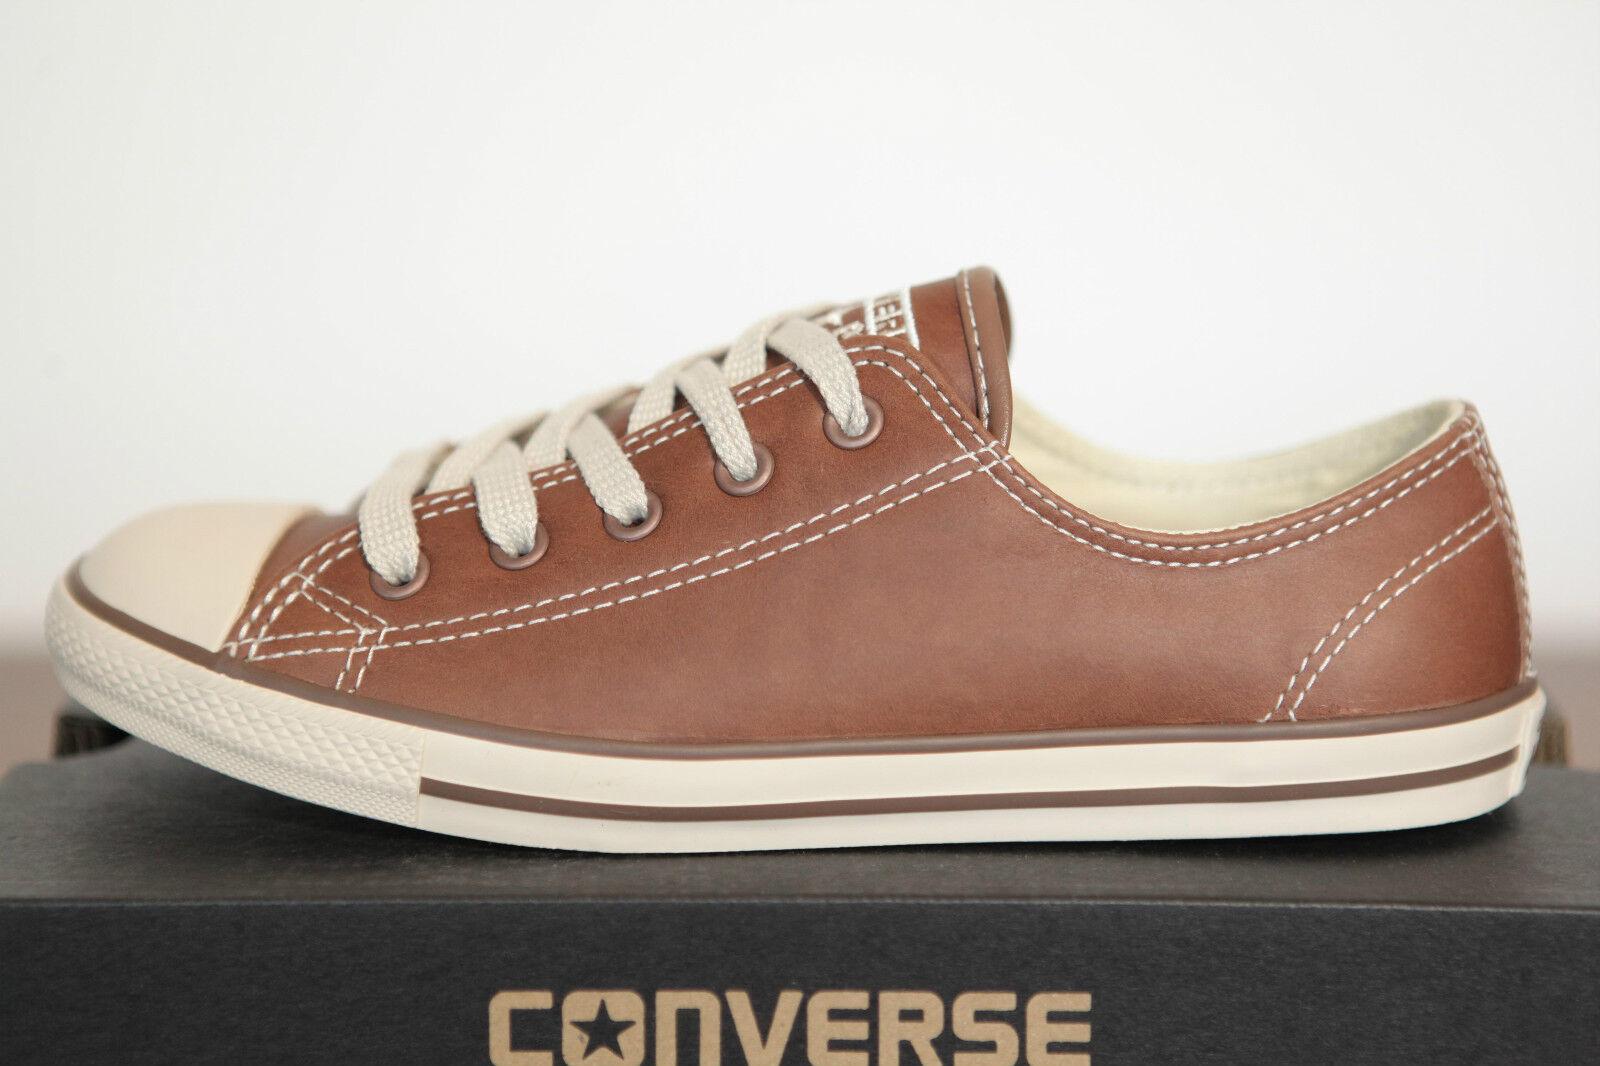 Neu Converse Chucks All Star Dainty low Sneaker Leder 537557c (79)